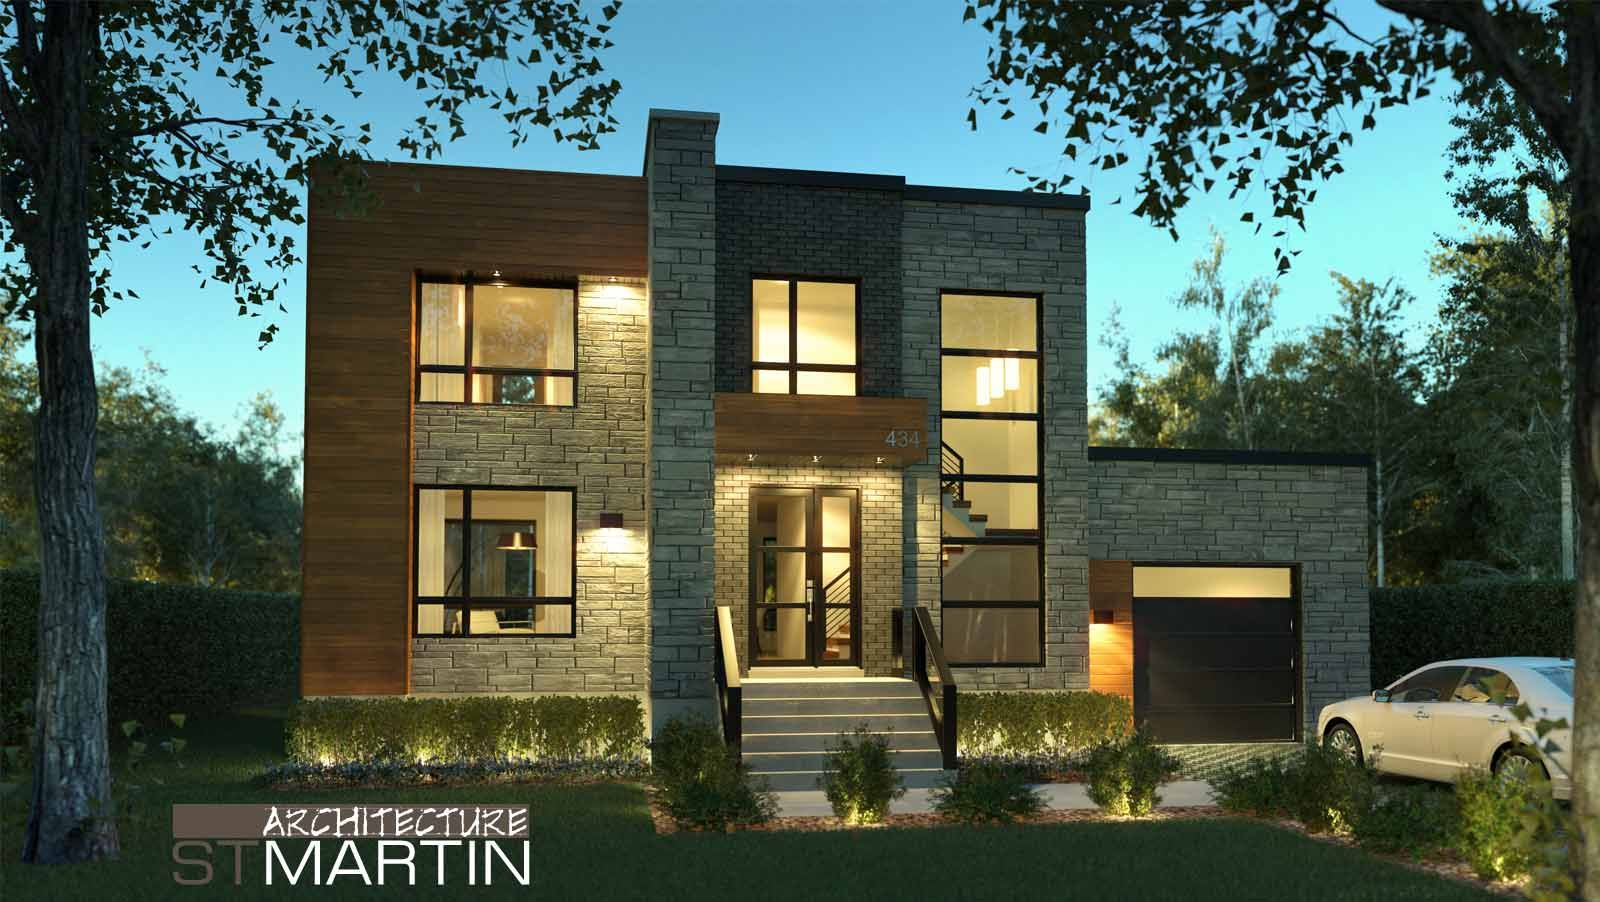 Architecture st martin maisons neuves